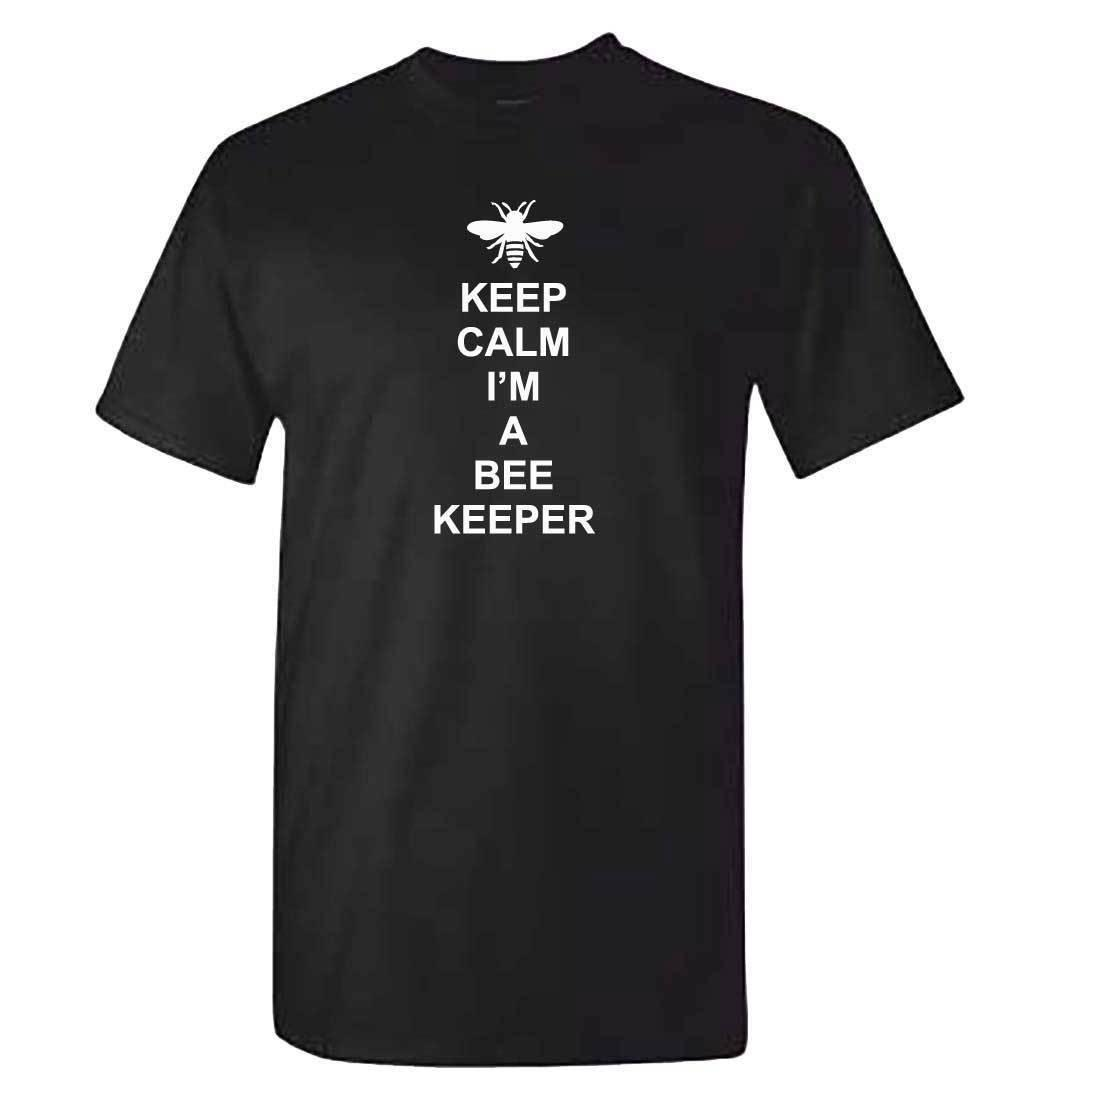 f6b699835a Mens Keep Calm BEEKEEPER TShirt Bee Keeper T Shirt Clothing Gift Arborist  Custom Printed Tshirt Hip Hop Funny Cotton Shirts White T Shirts From  Hermestshirt ...